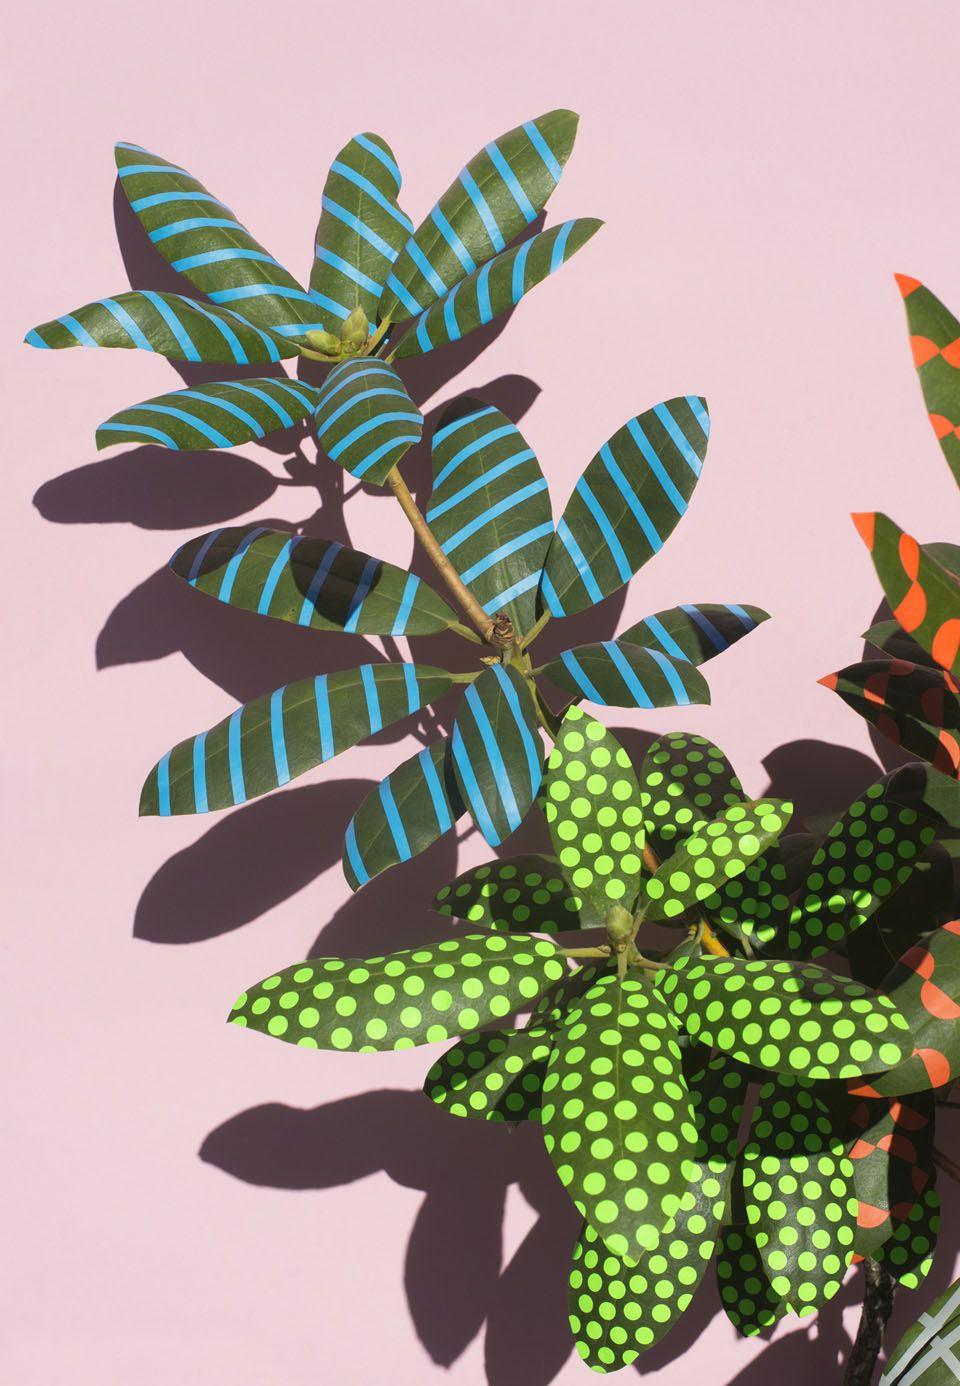 herbier revisit herbier d corations et vegetal